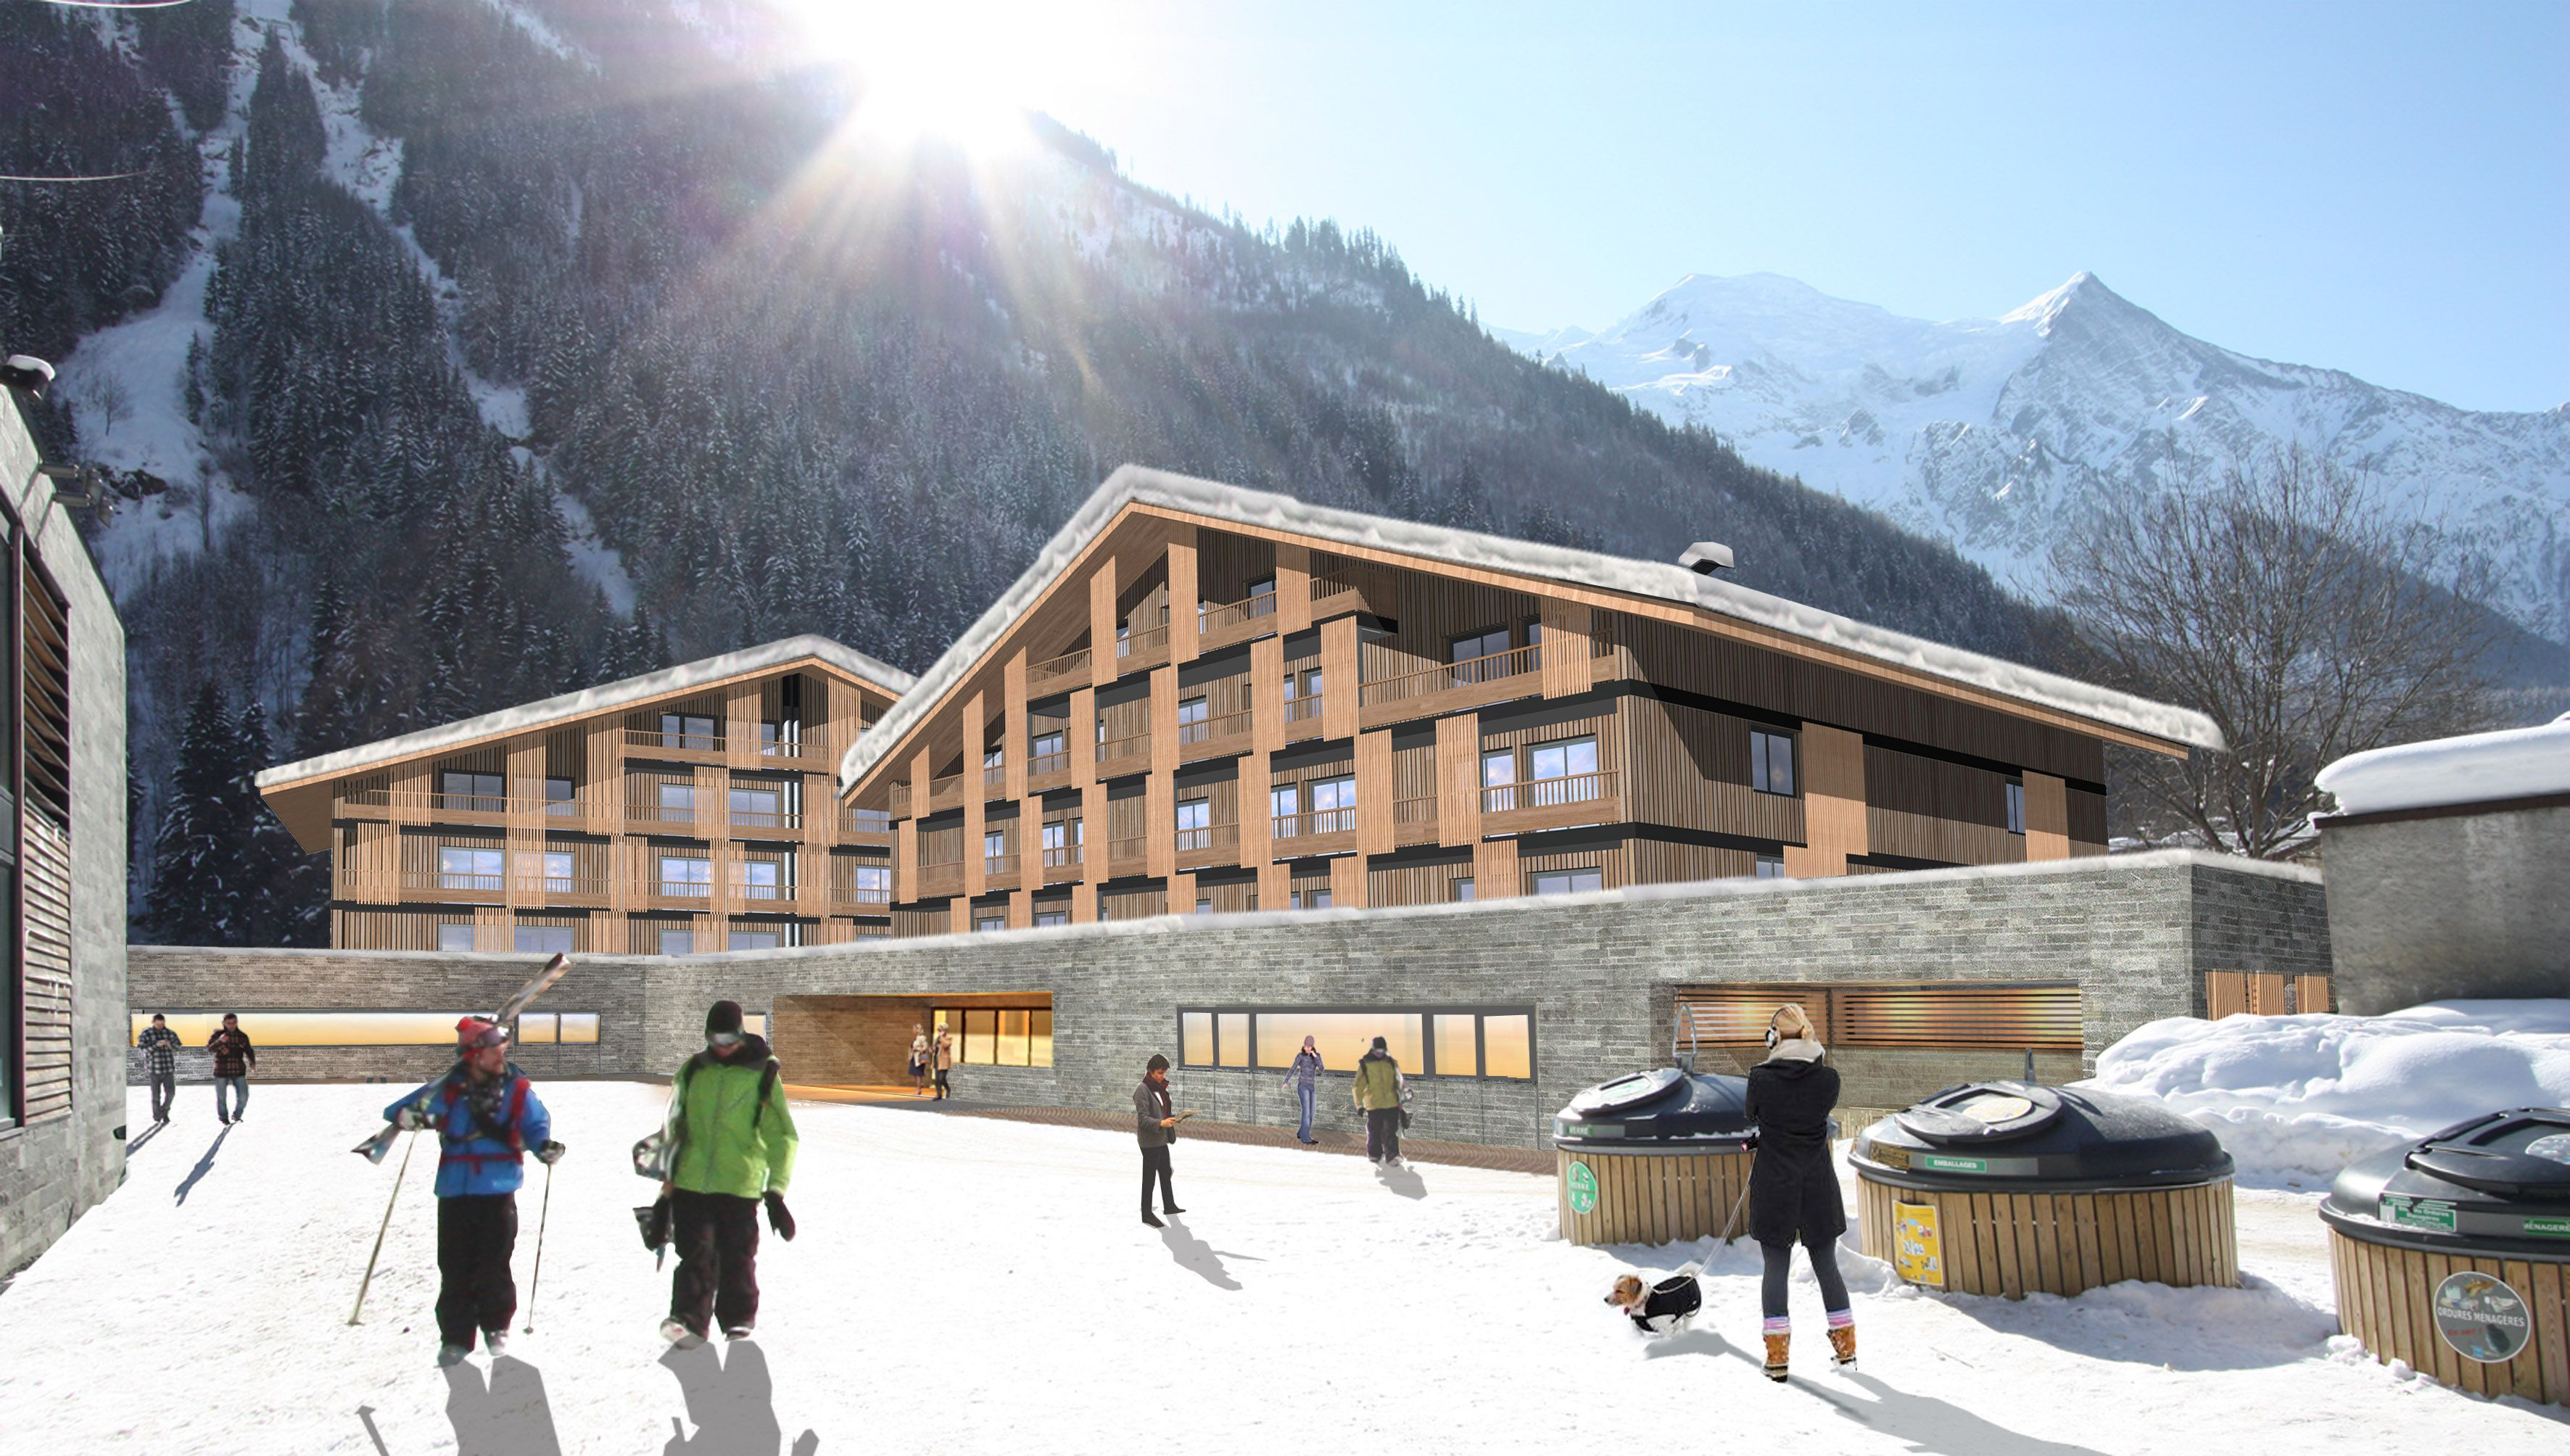 Hotel Heliopic Sweet Spa Chamonix Mont Blanc Oteller